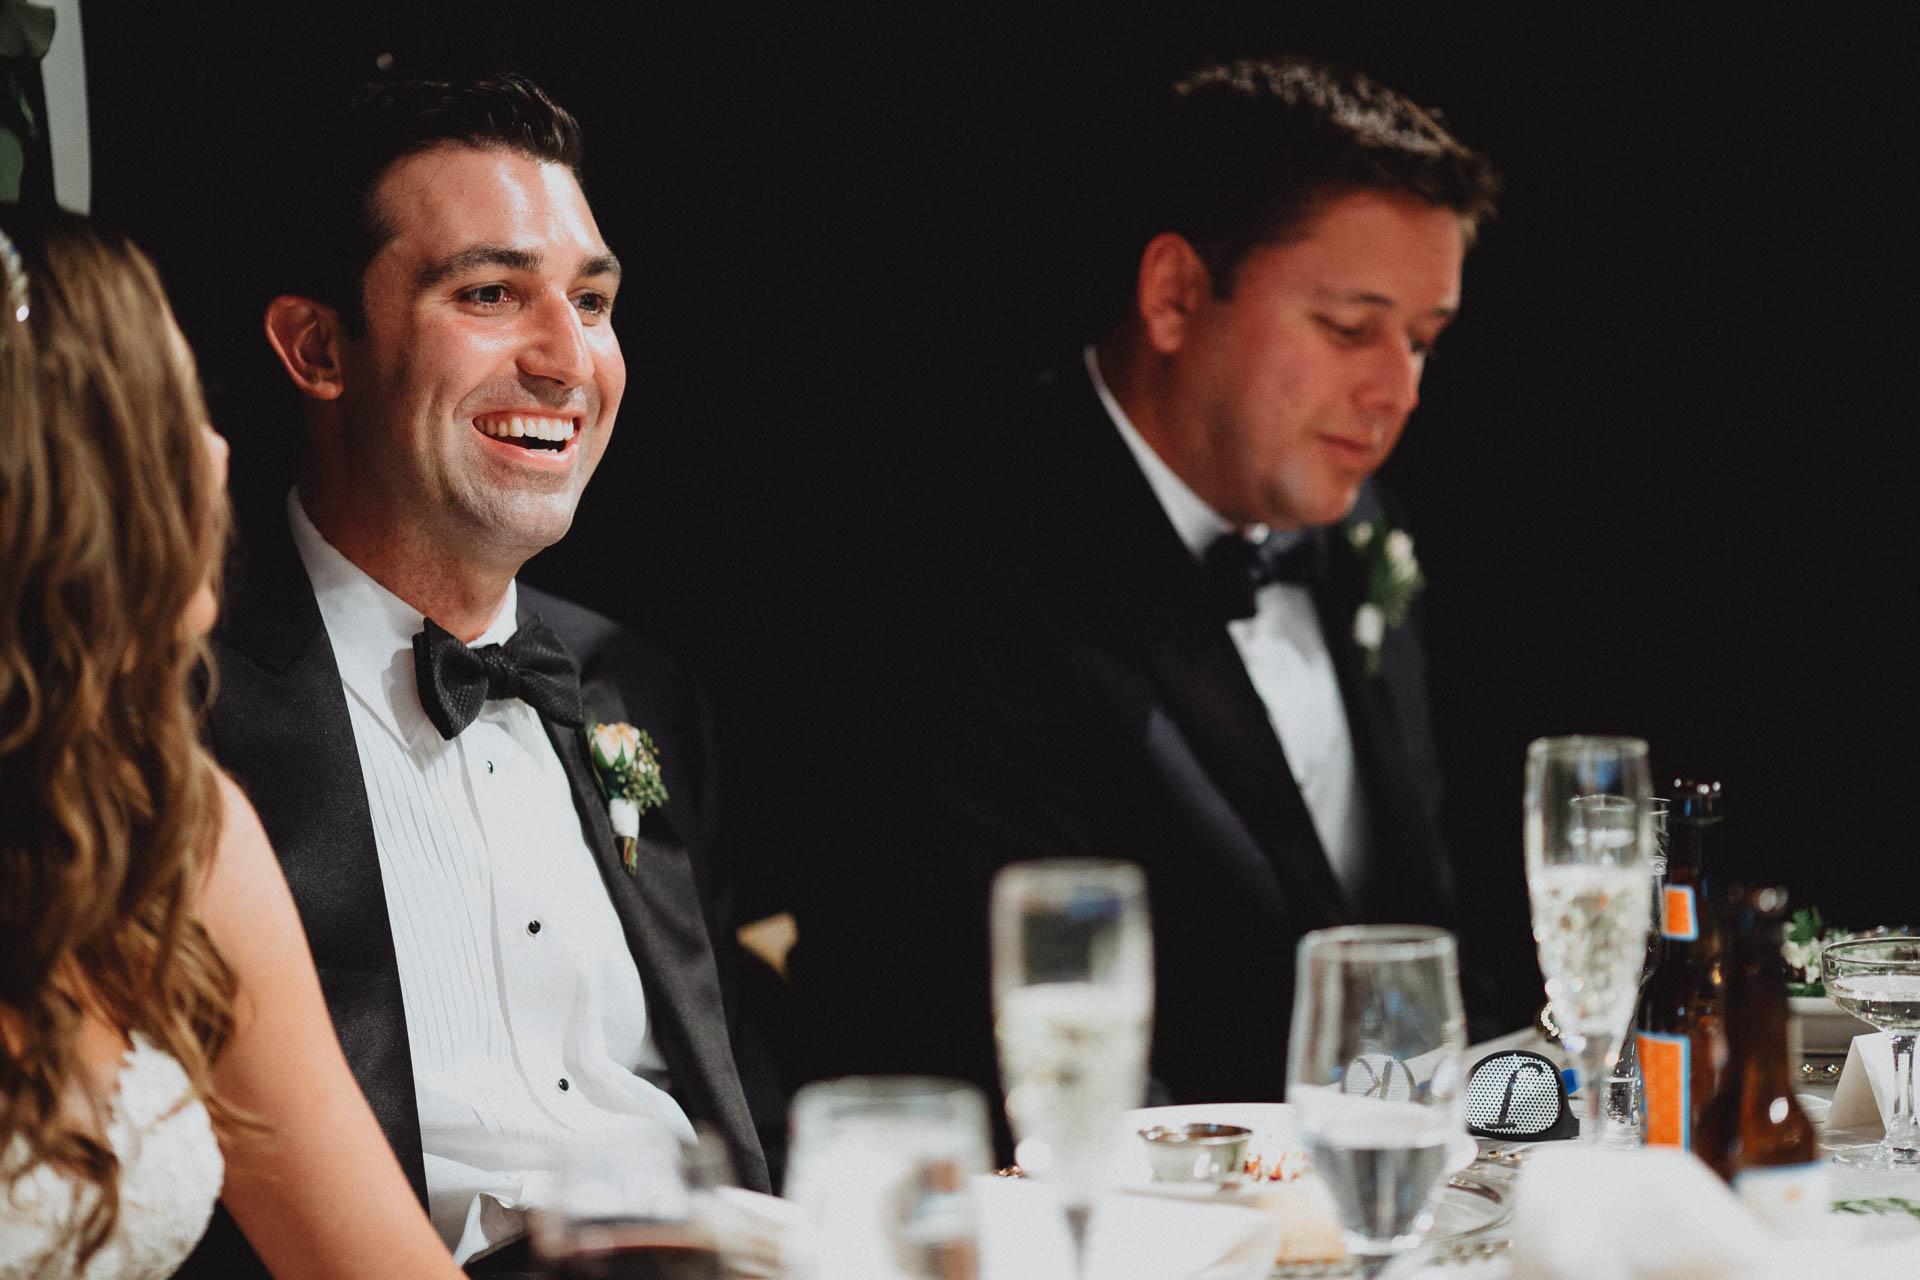 Keri-Joseph-Top-of-the-Market-Wedding-180@2x.jpg